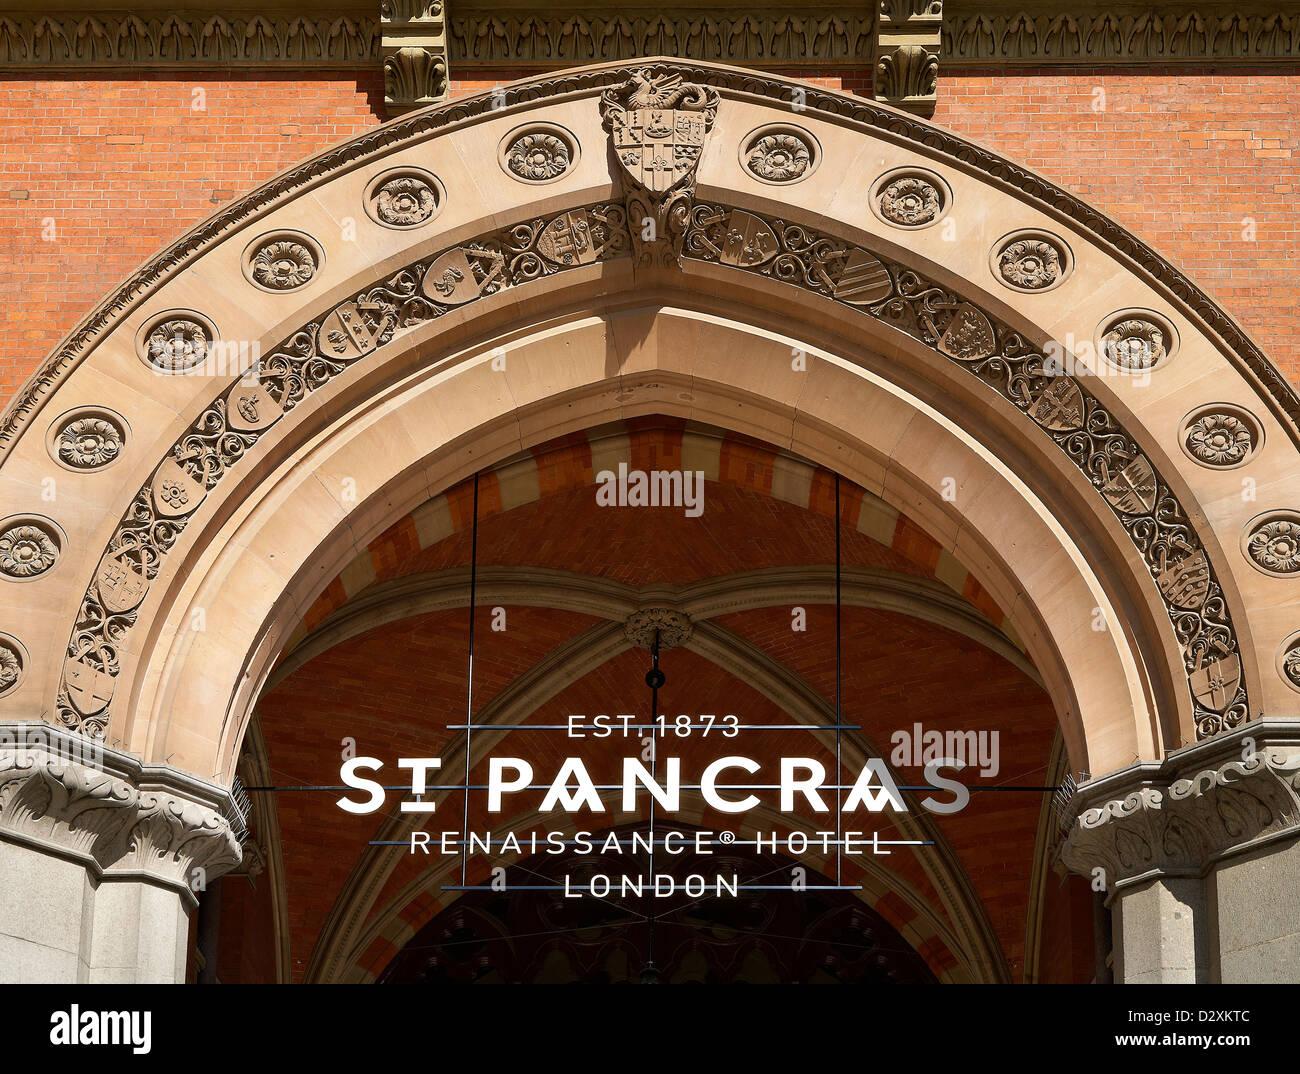 St Pancras Hotel, London, United Kingdom. Architect: Sir Giles Gilbert Scott with Richard Griffiths Arc, 2011. Hotel - Stock Image